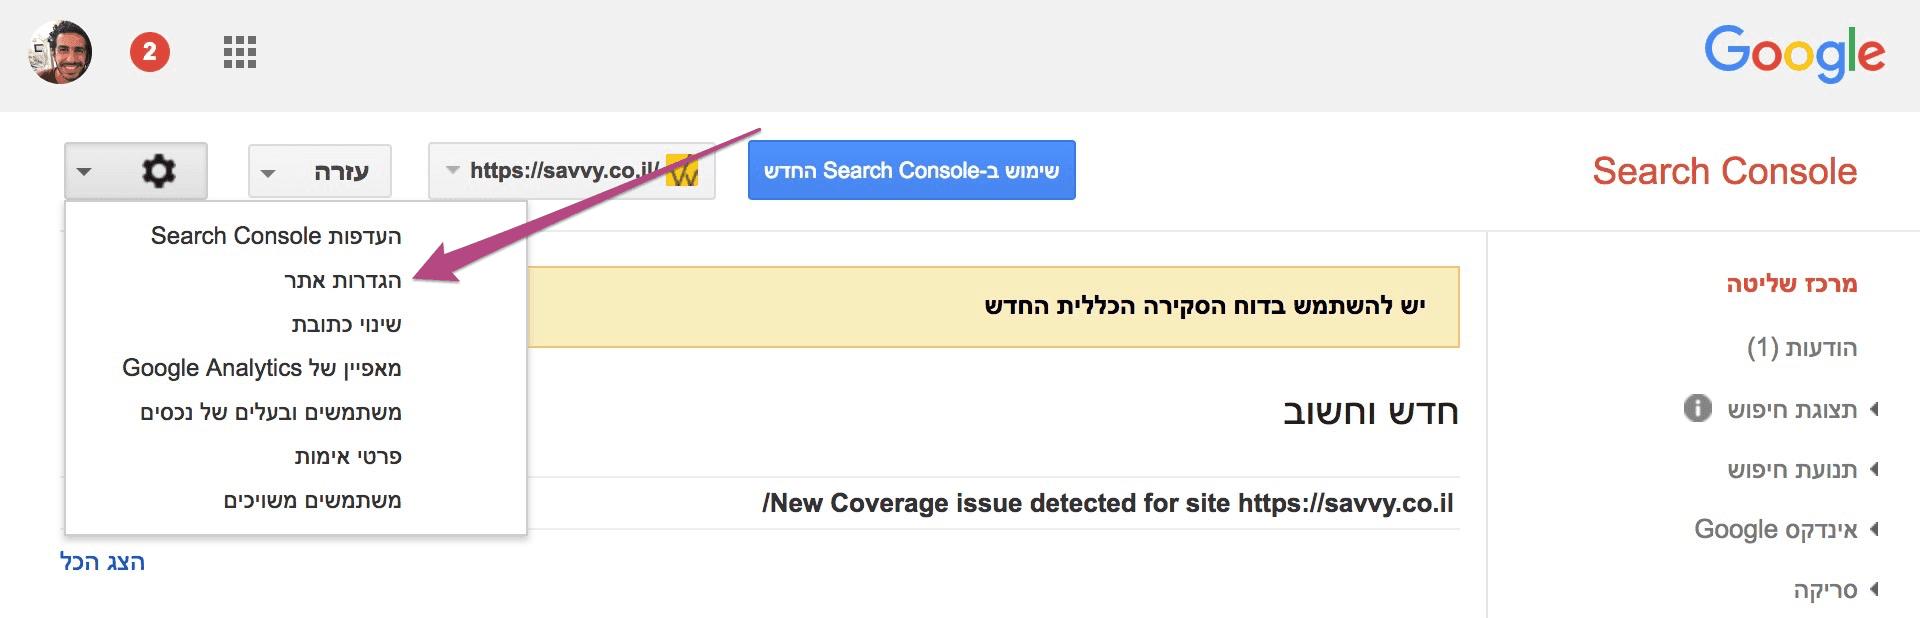 Site Settings - Google Search Console